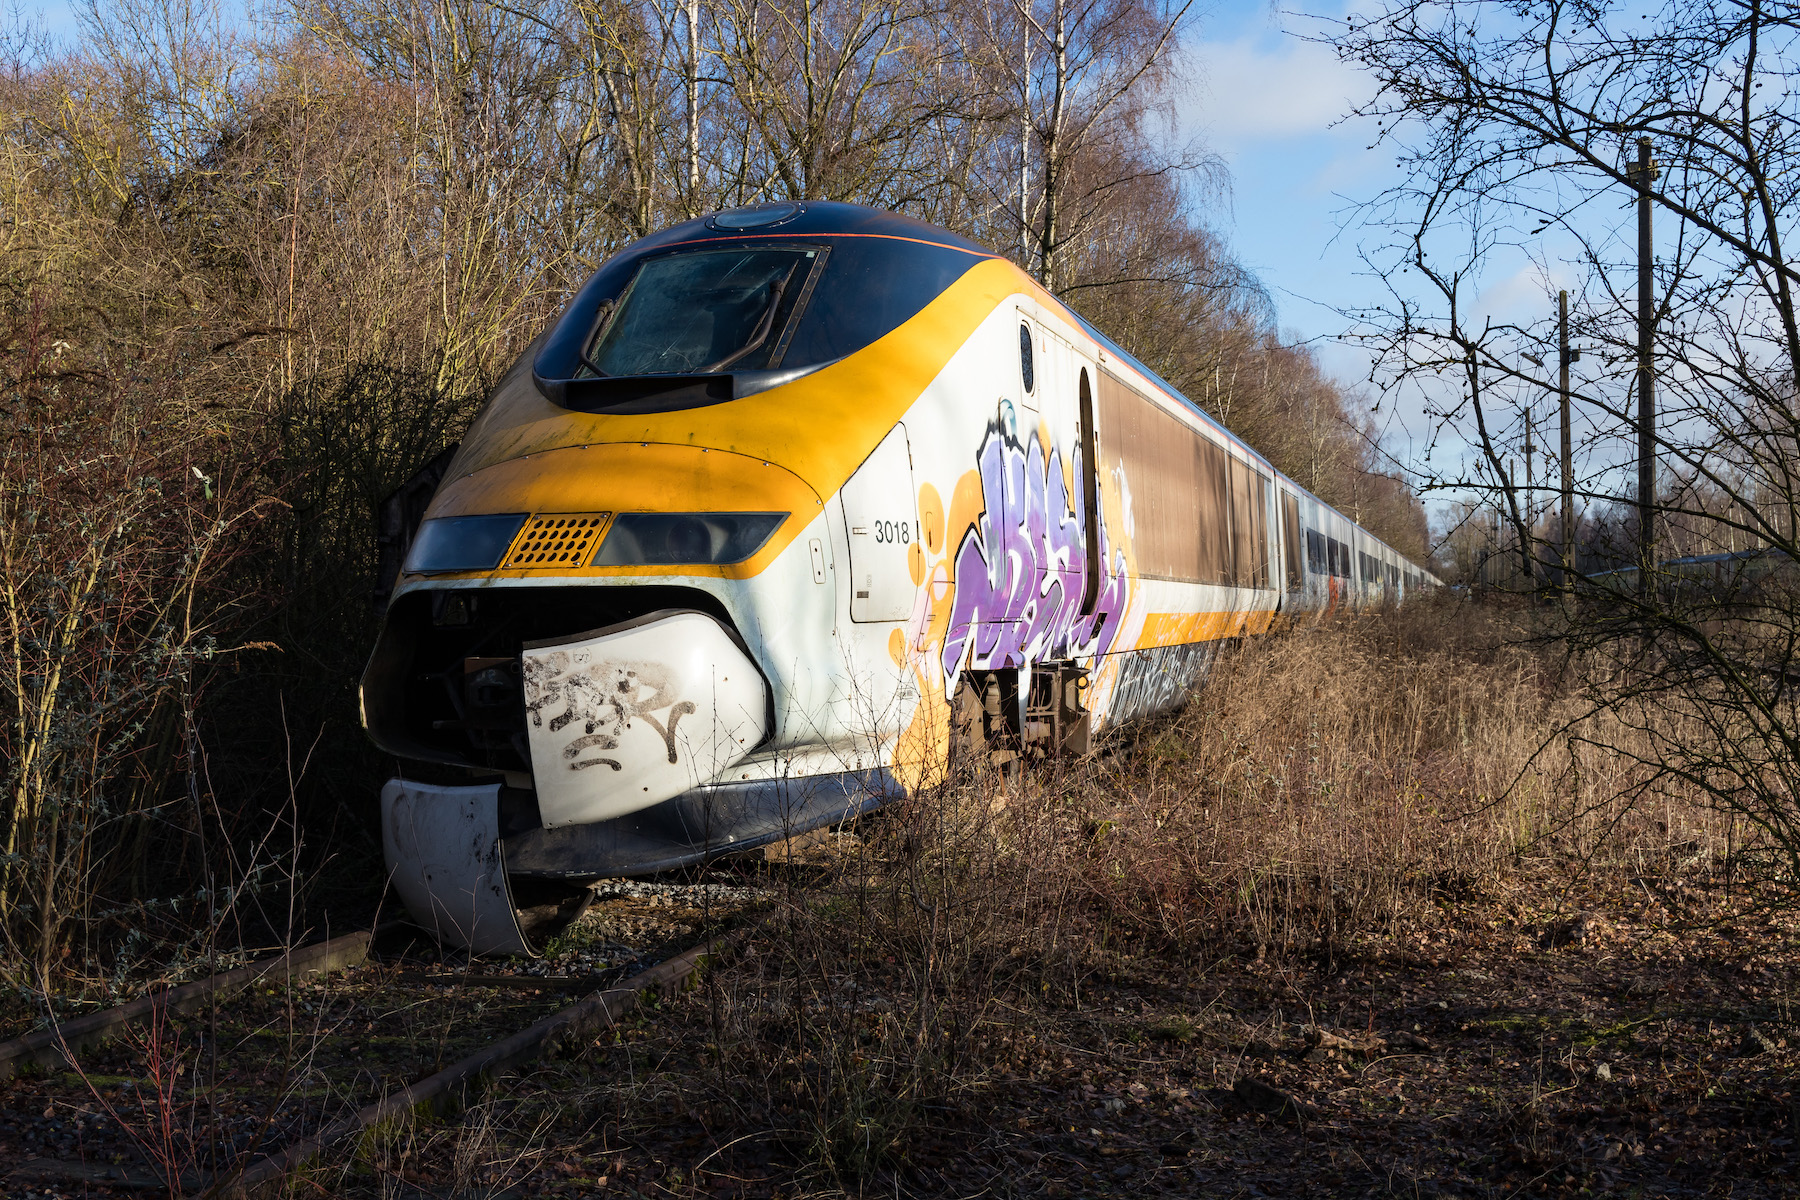 Abandoned Eurostar 3017:3018 near Valenciennes